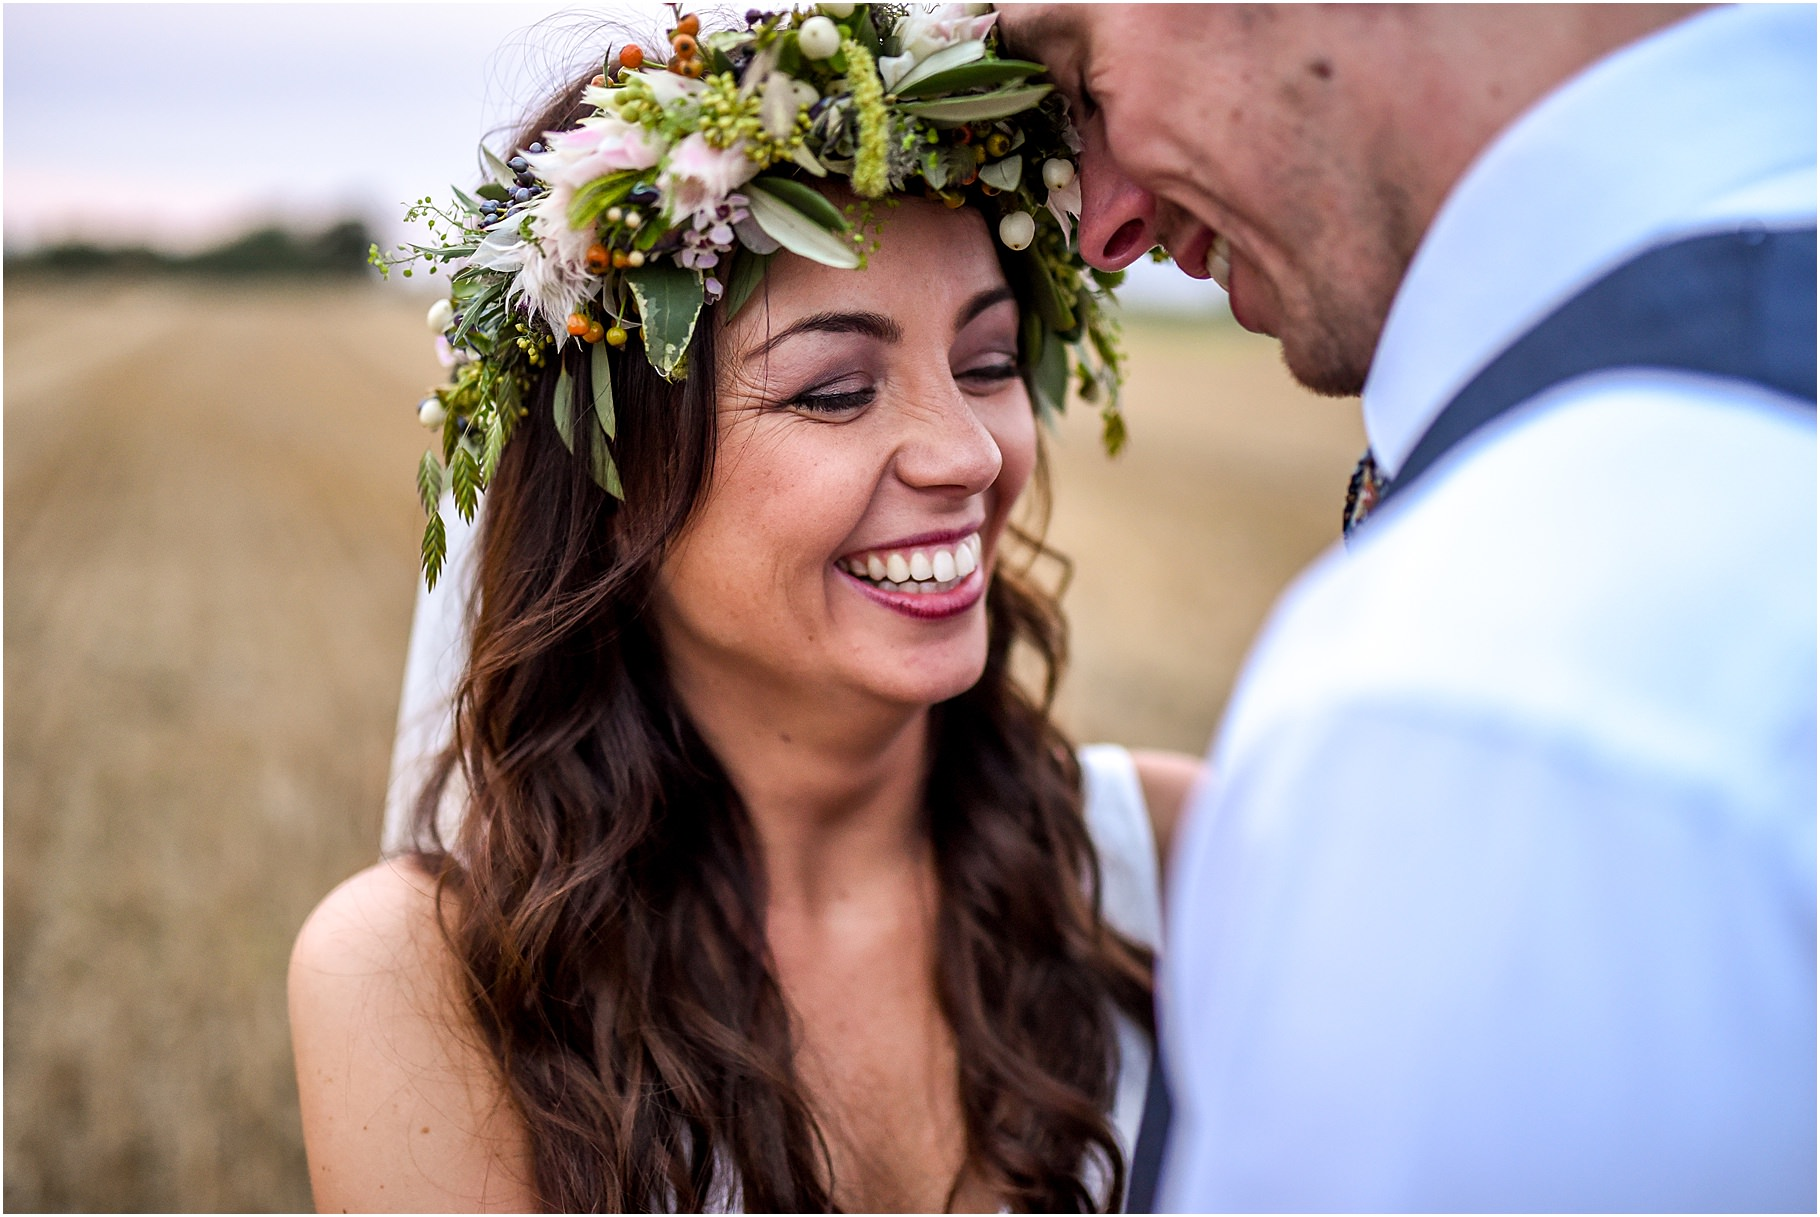 dan-wootton-photography-2017-weddings-040.jpg